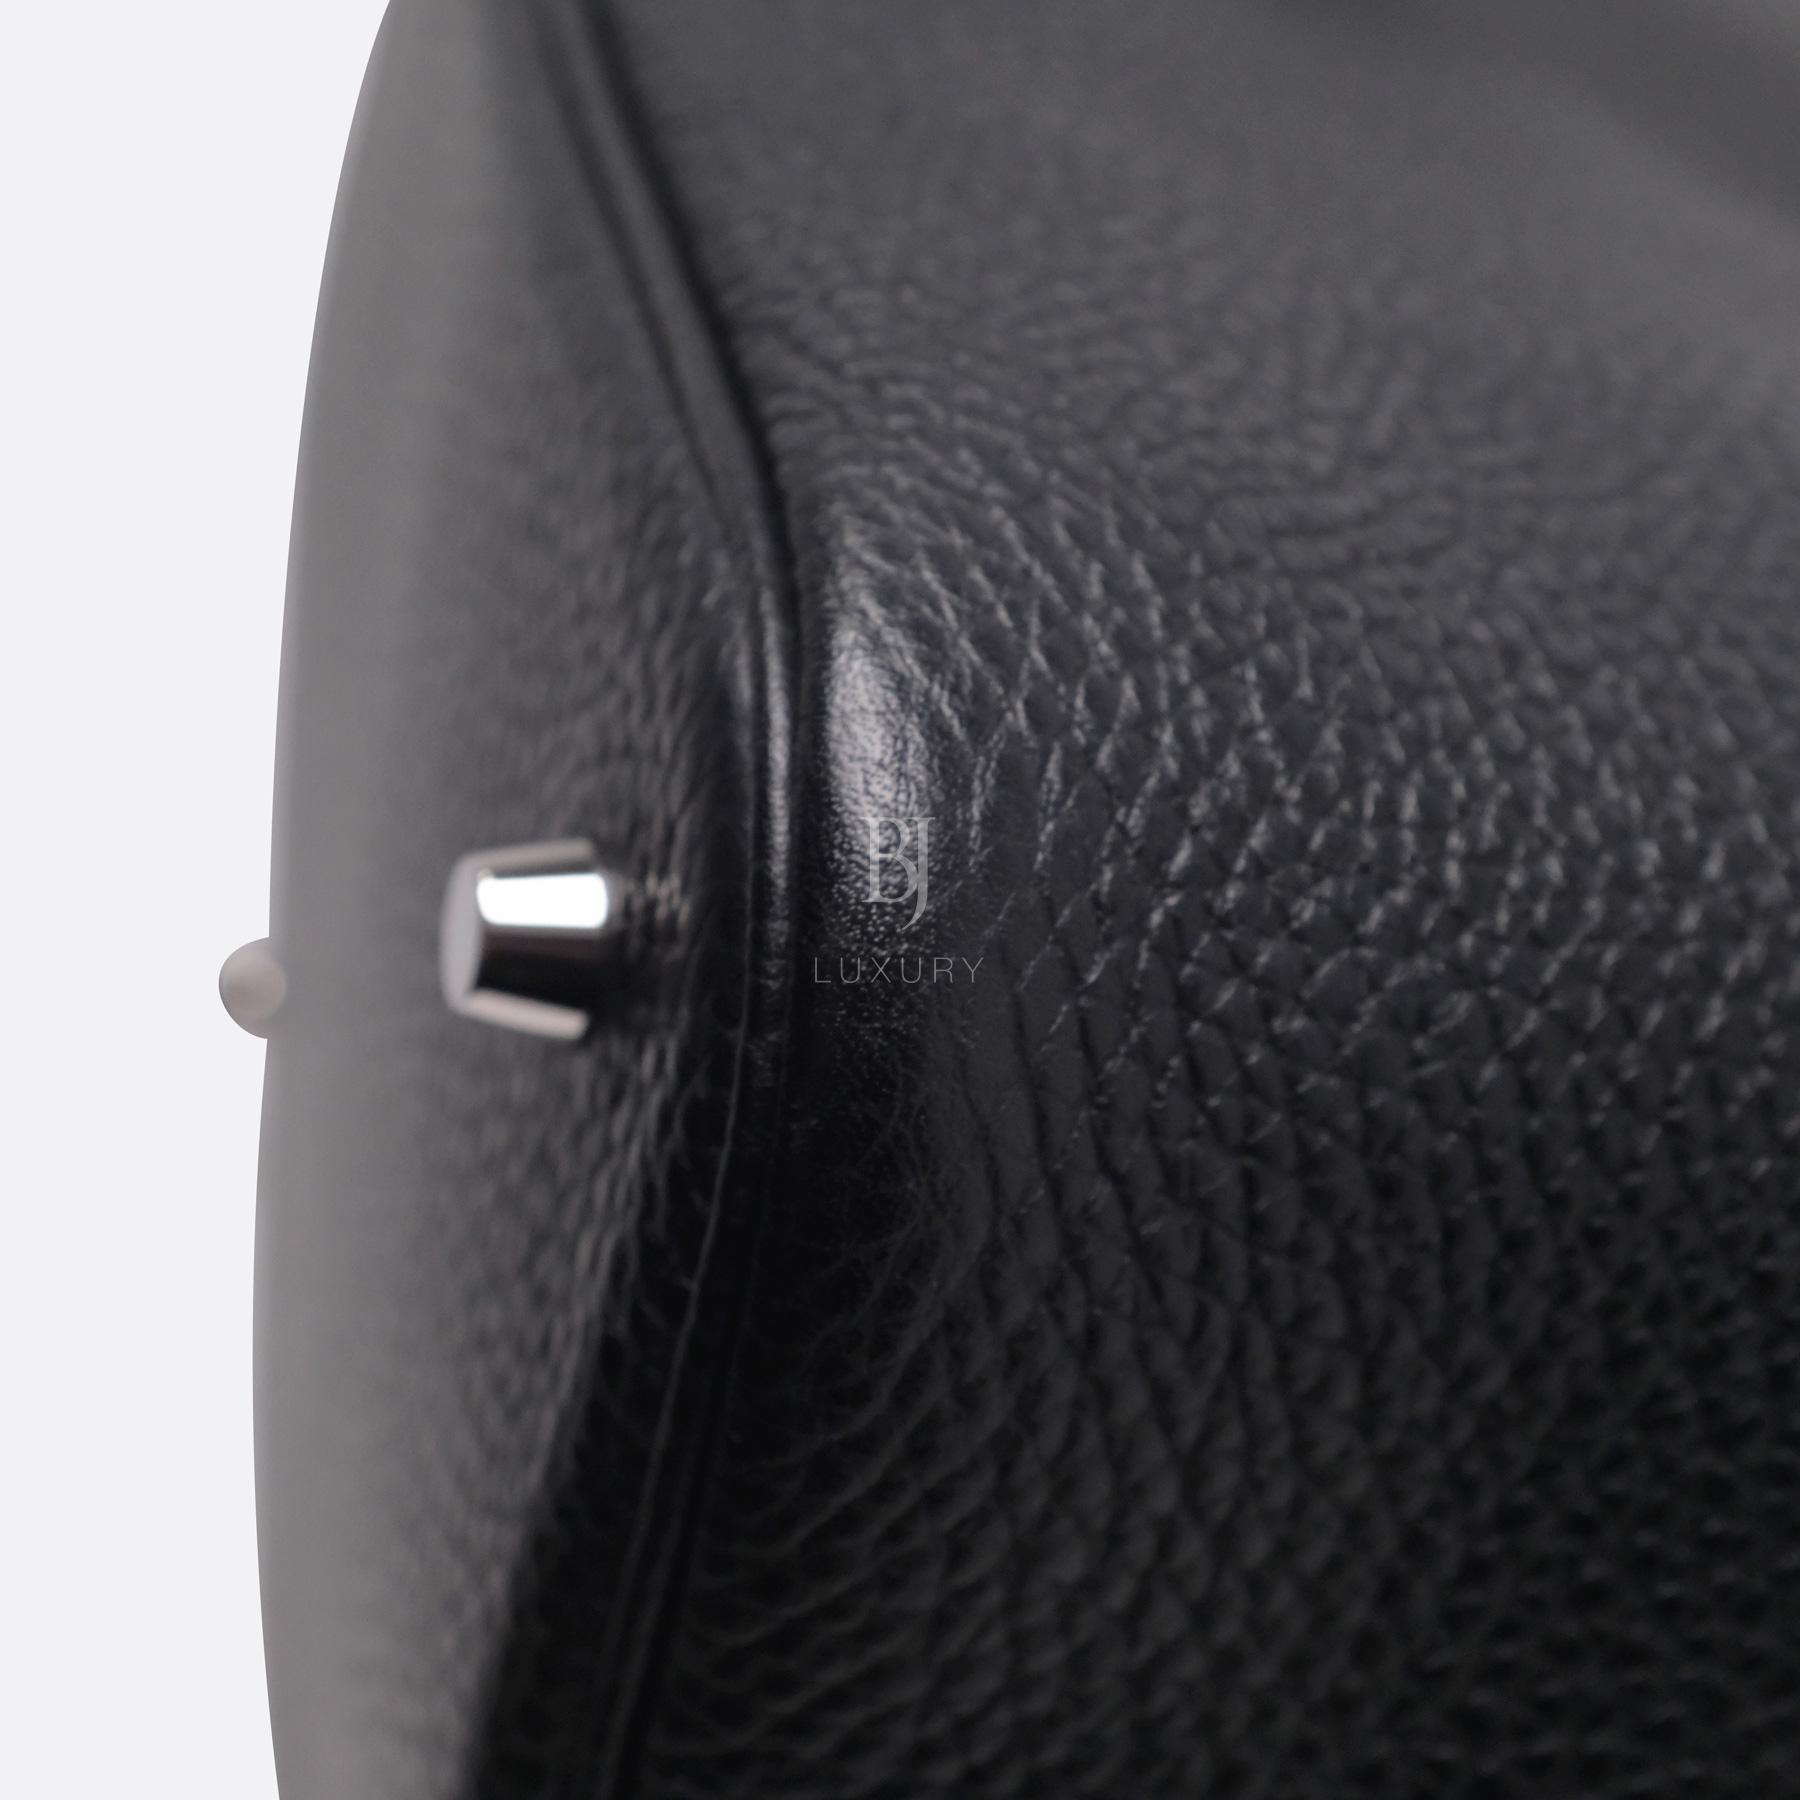 Hermes Picotin 22 Palladium Clemence BJ Luxury 8.jpg